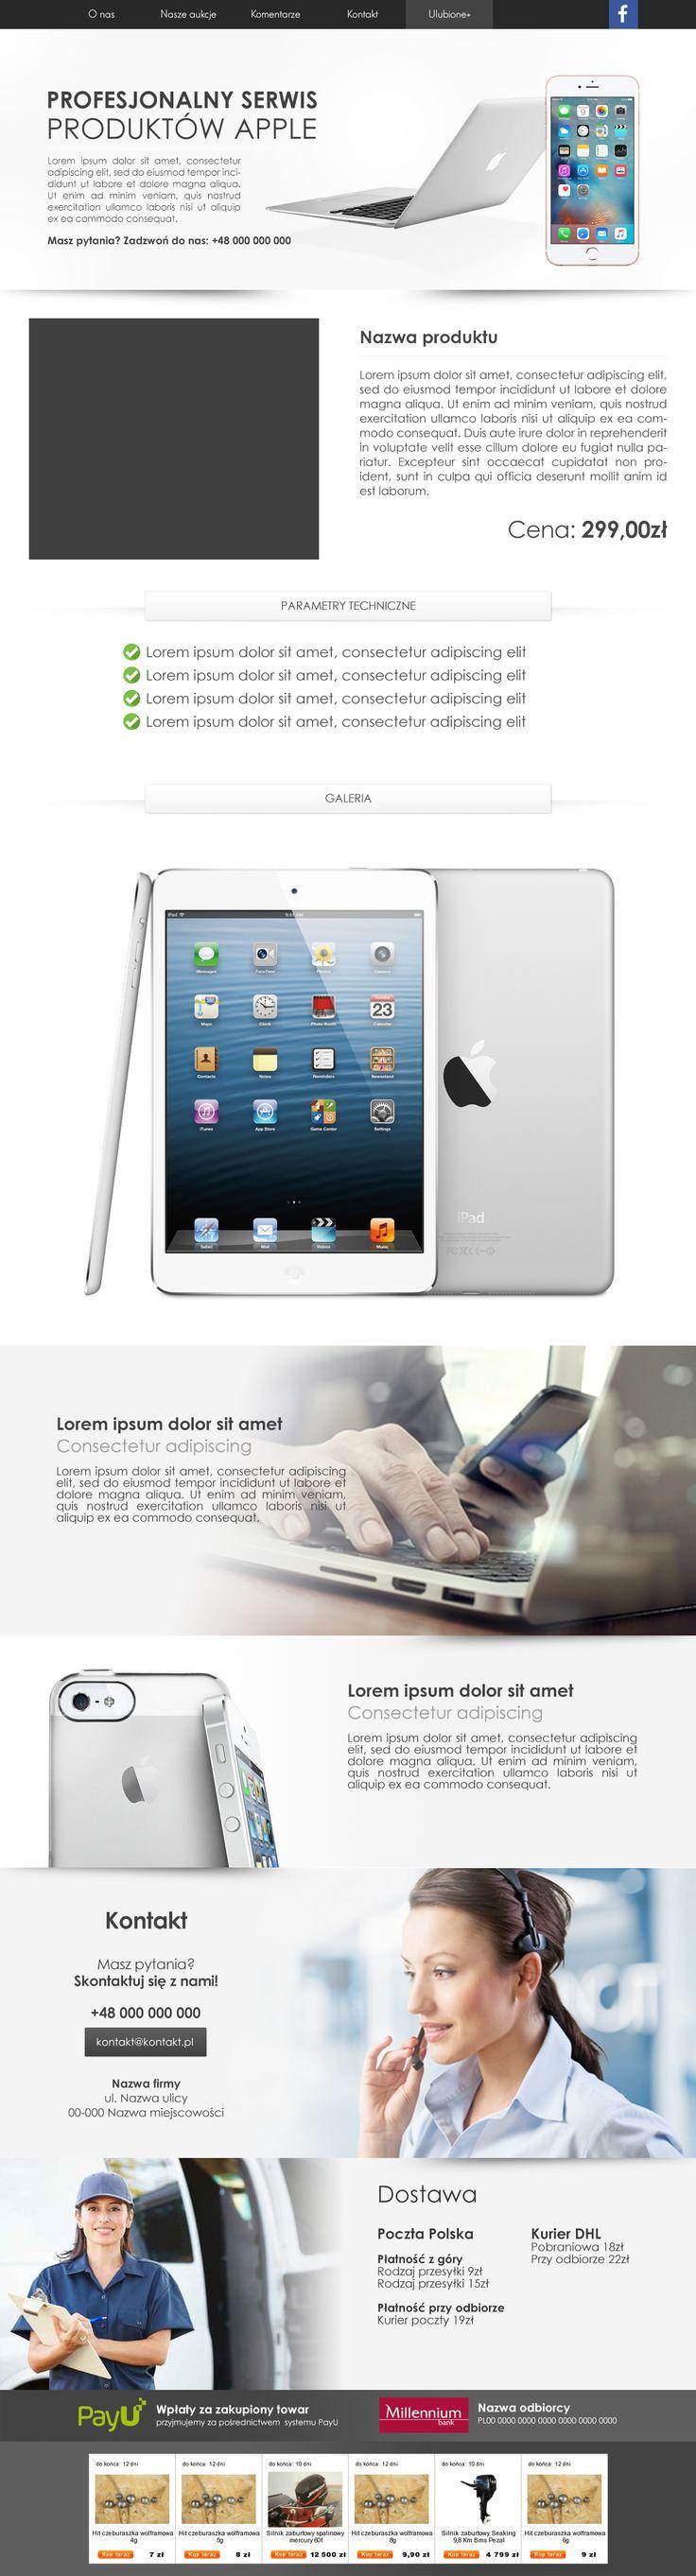 Szablon aukcyjny stworzony pod sprzedaż elektroniki. #szablonallegro #tablety #elektronika #allegro #allegrodesign